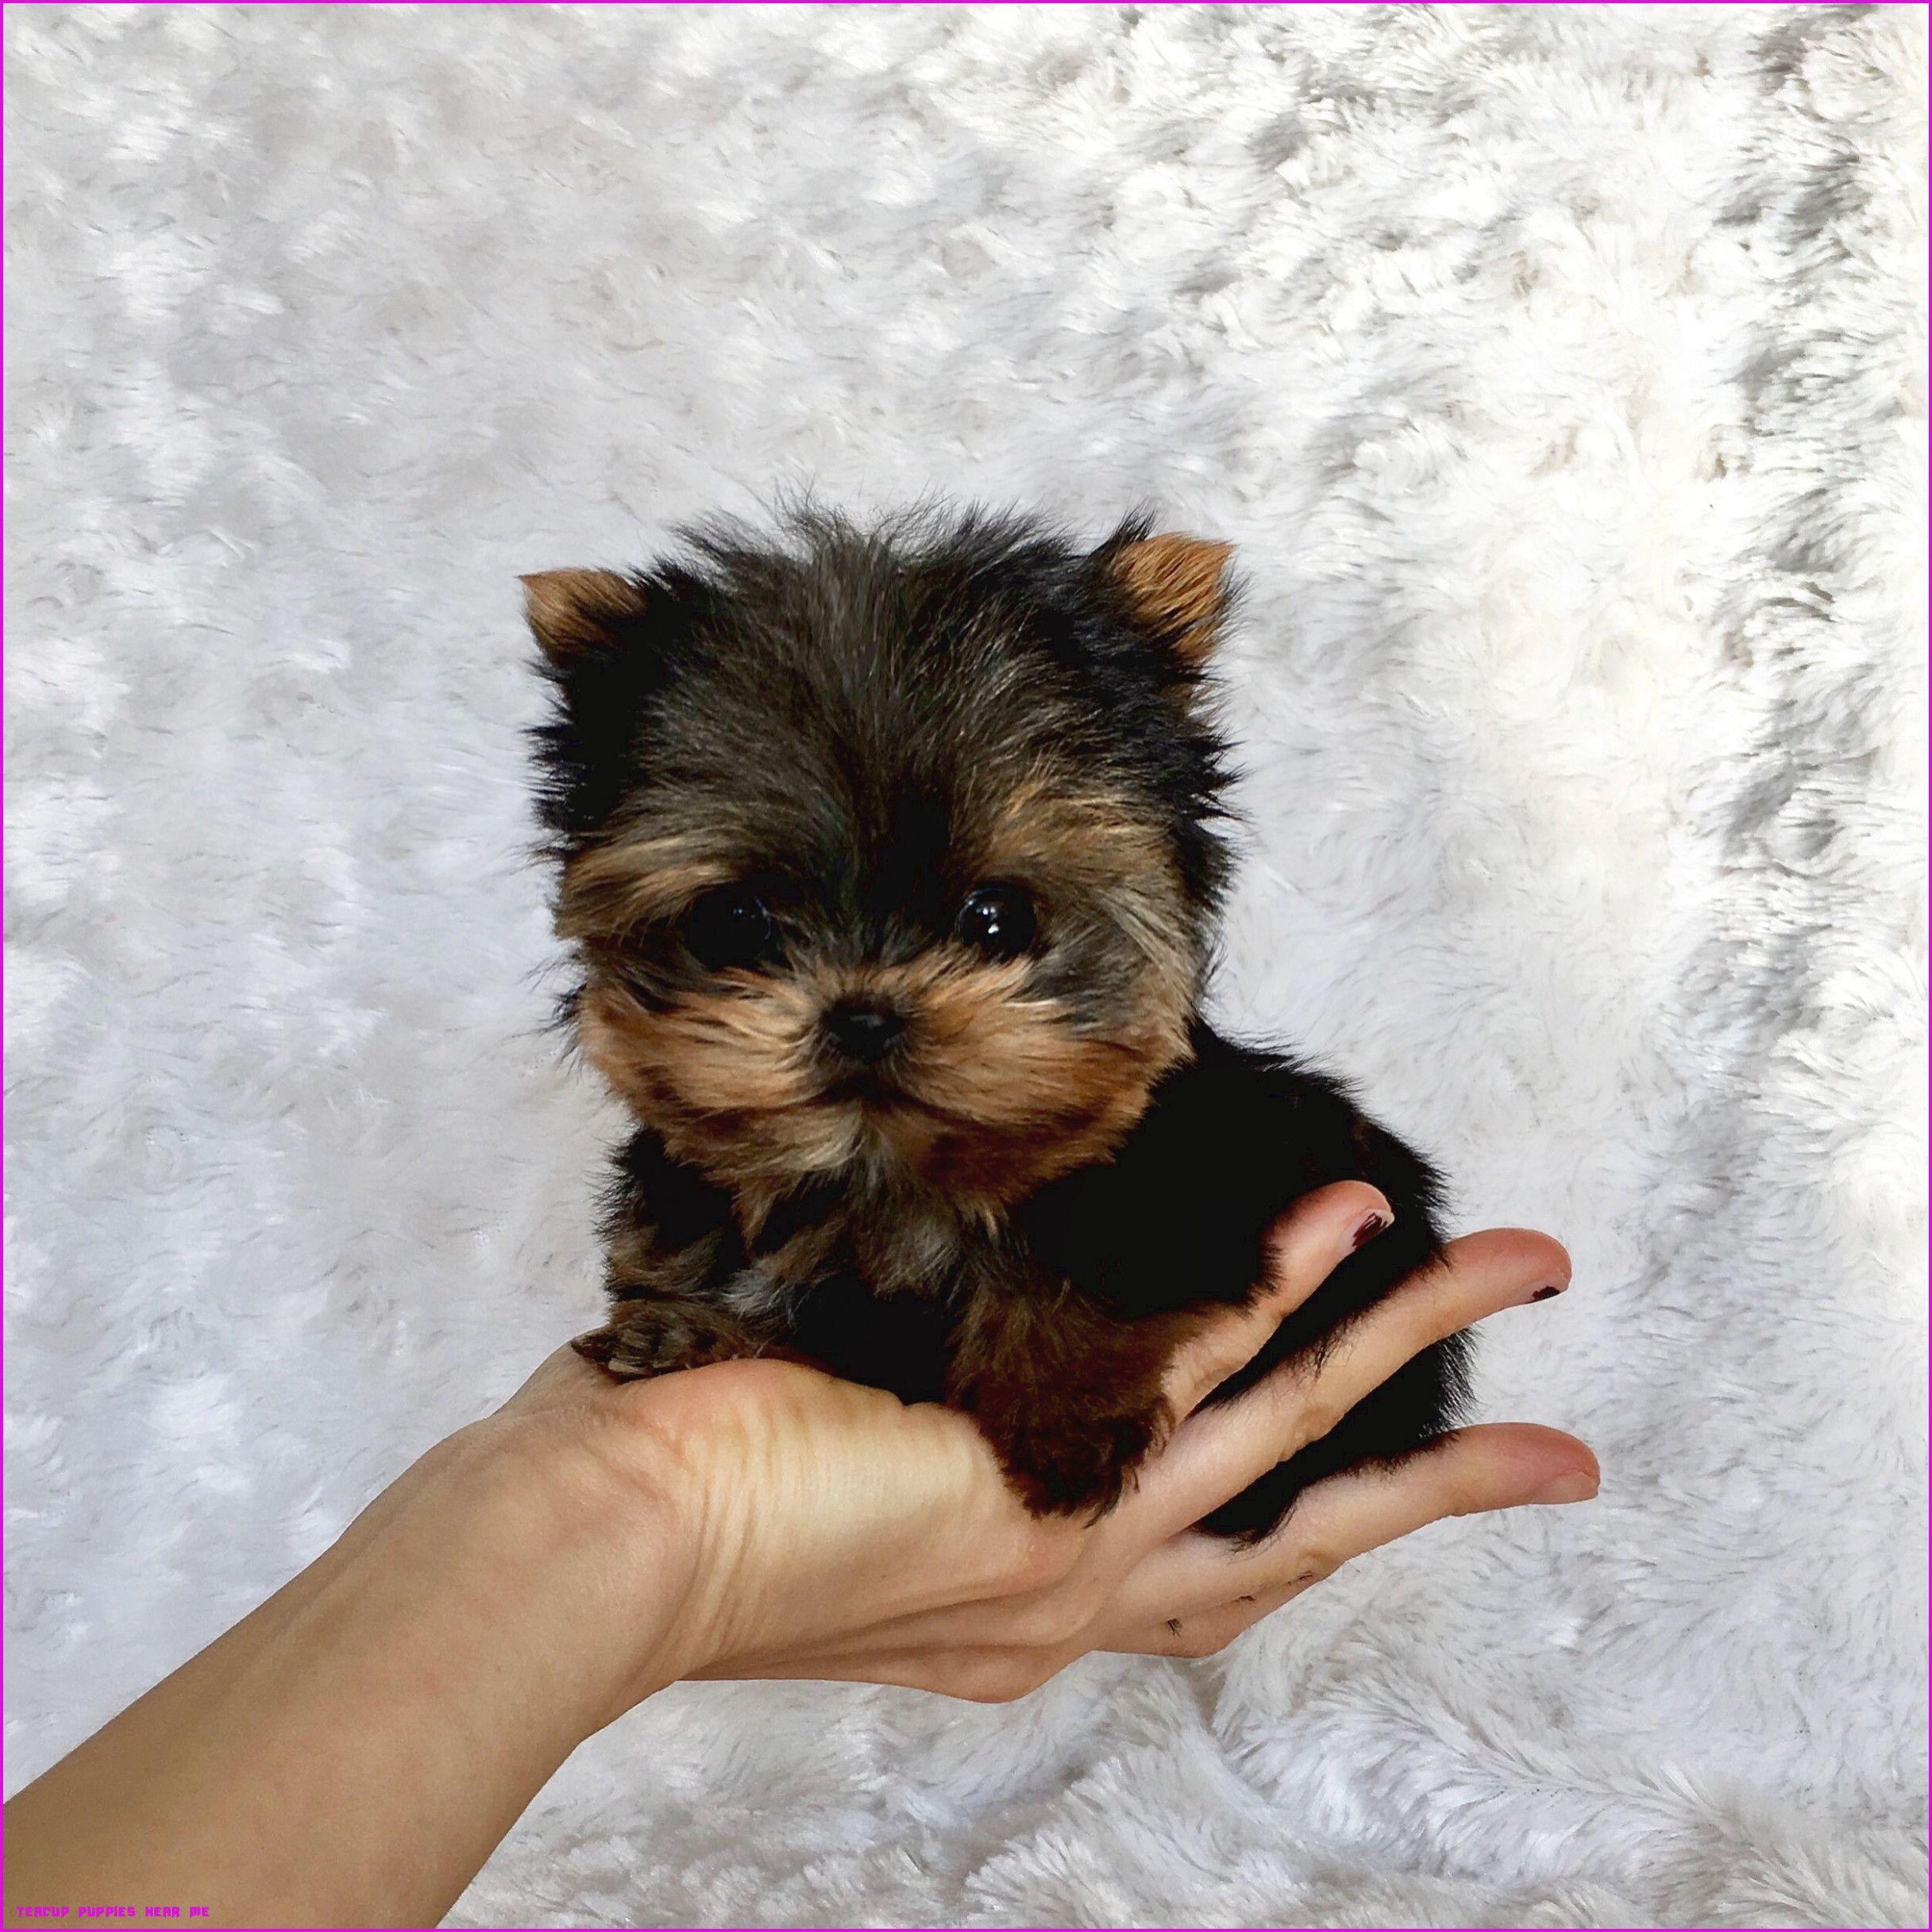 The Hidden Agenda Of Teacup Puppies Near Me Teacup Puppies Near Me In 2020 Puppies For Sale Teacup Puppies Yorkshire Terrier Puppies